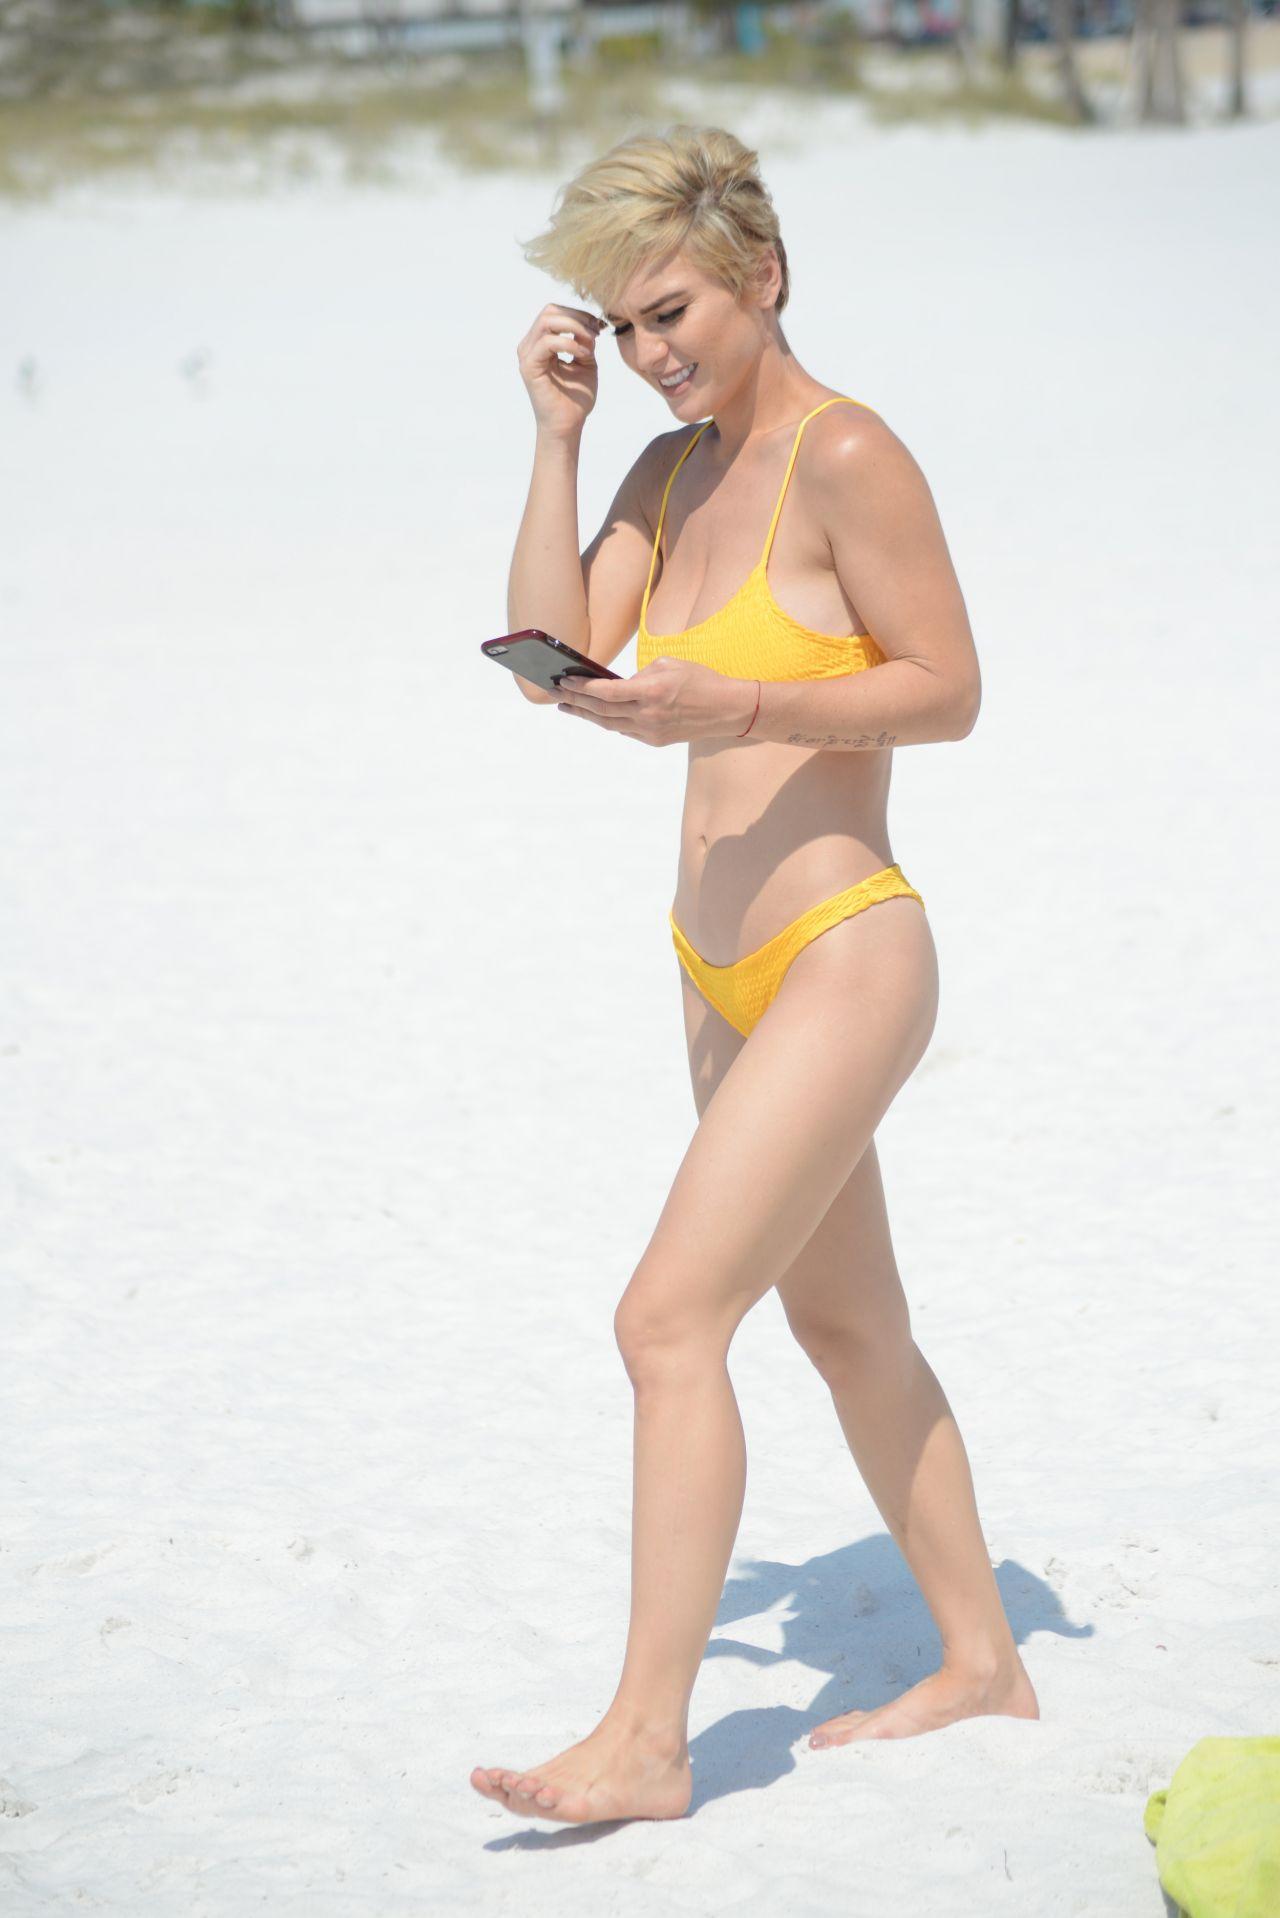 Video Lauren Elizabeth Hubbard nudes (85 foto and video), Topless, Leaked, Boobs, bra 2019